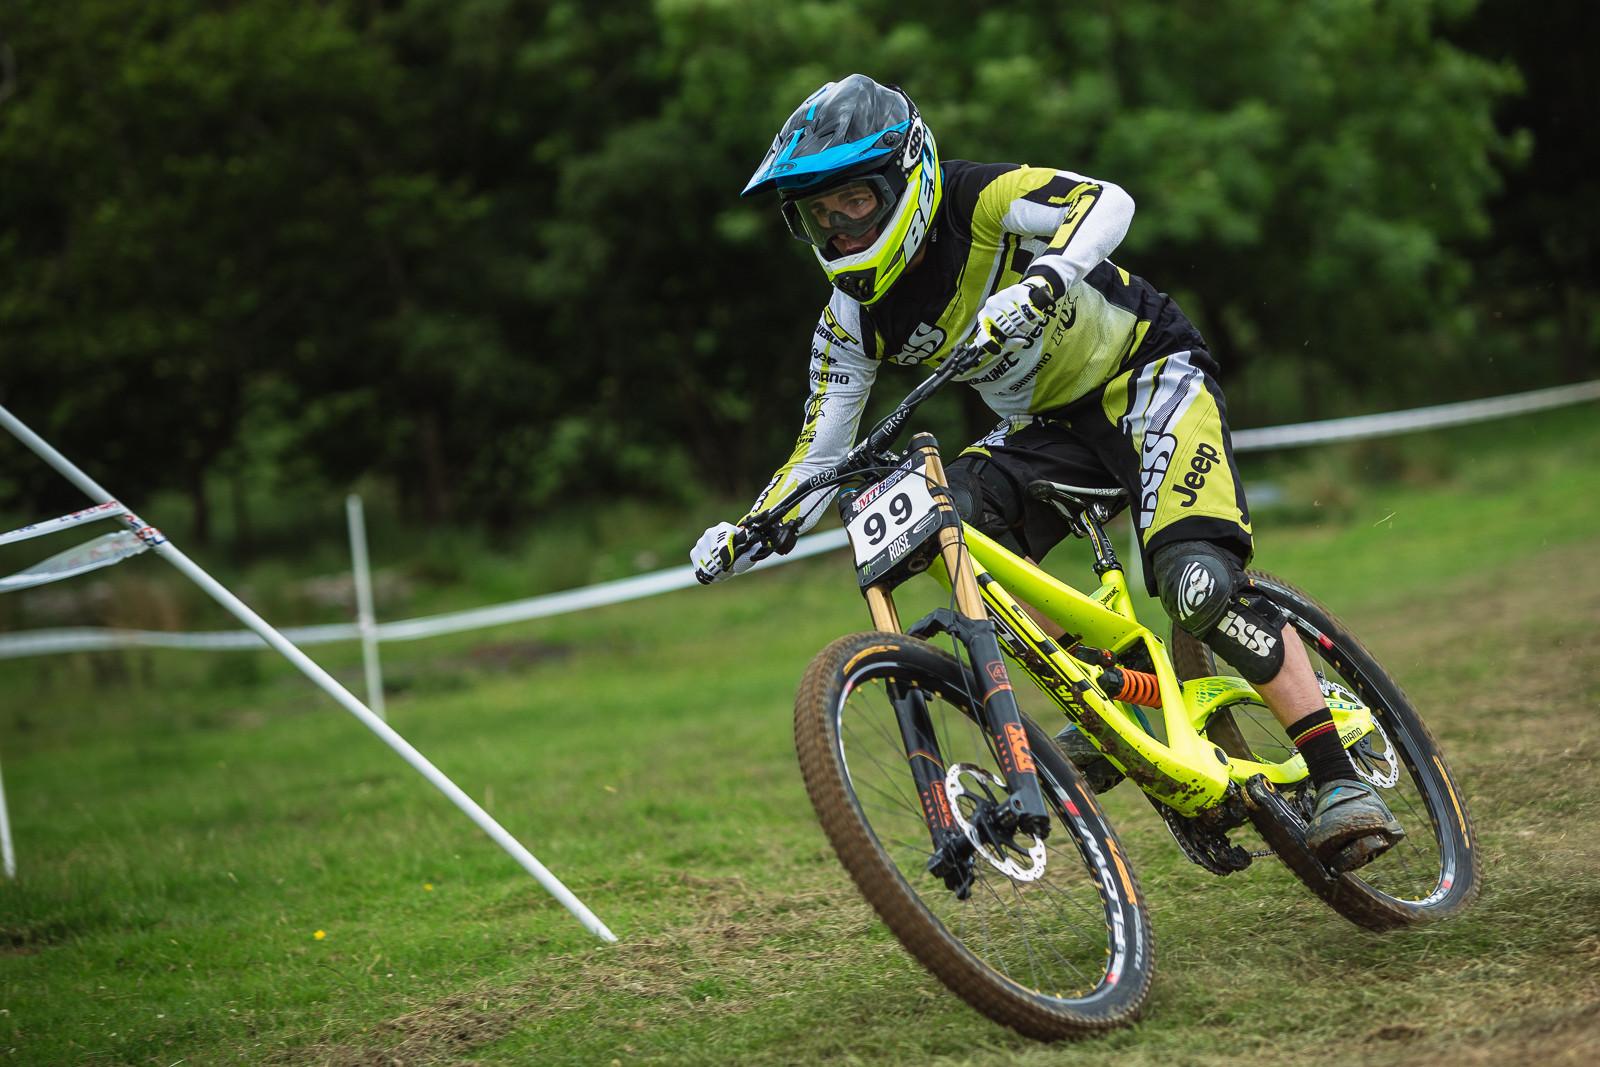 Taylor Vernon, British DH Series, Bala - RACE REPORT - 2015 British Downhill Series Bala - Mountain Biking Pictures - Vital MTB